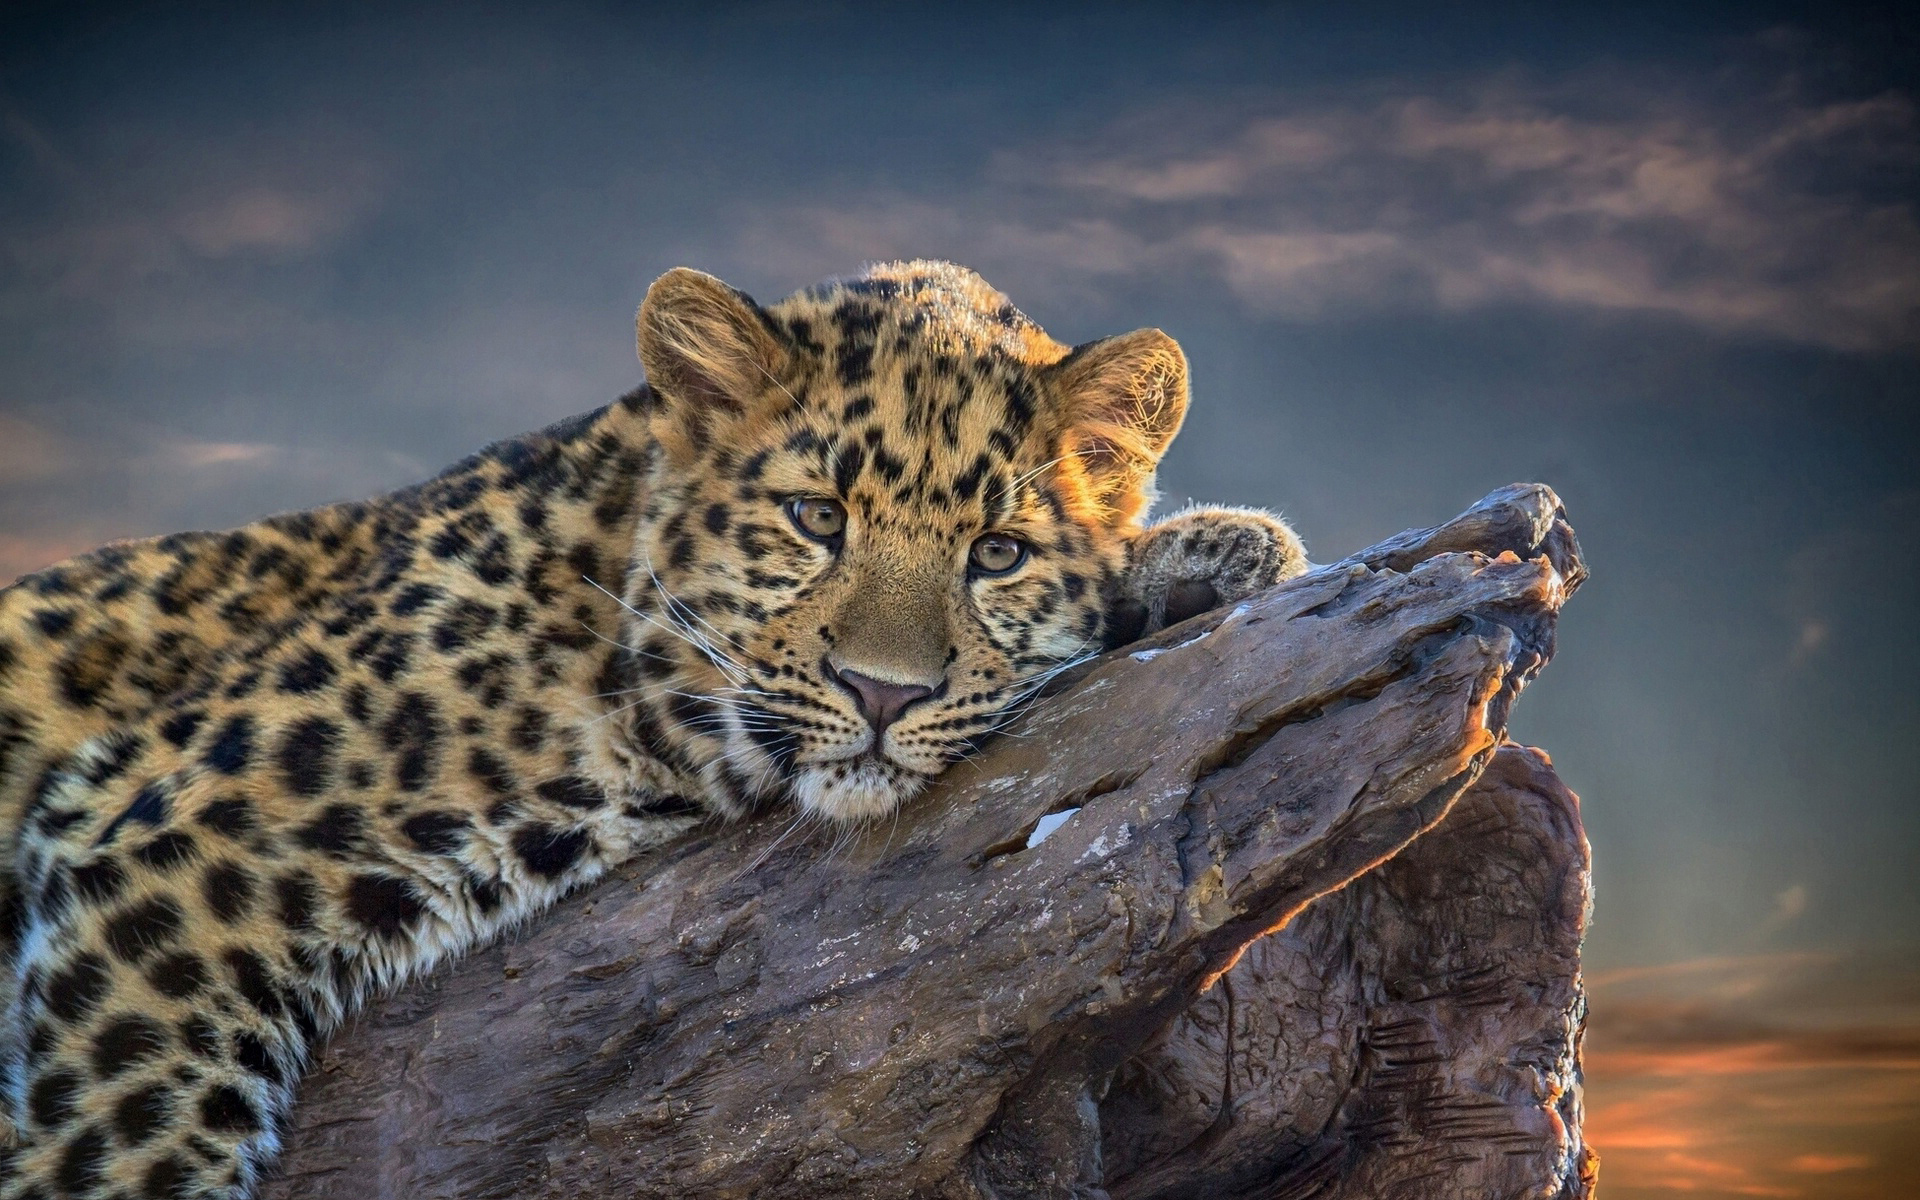 Wallpaper Cheetah Pair Hd Animals 6057: Beautiful Leopard HD Wallpaper